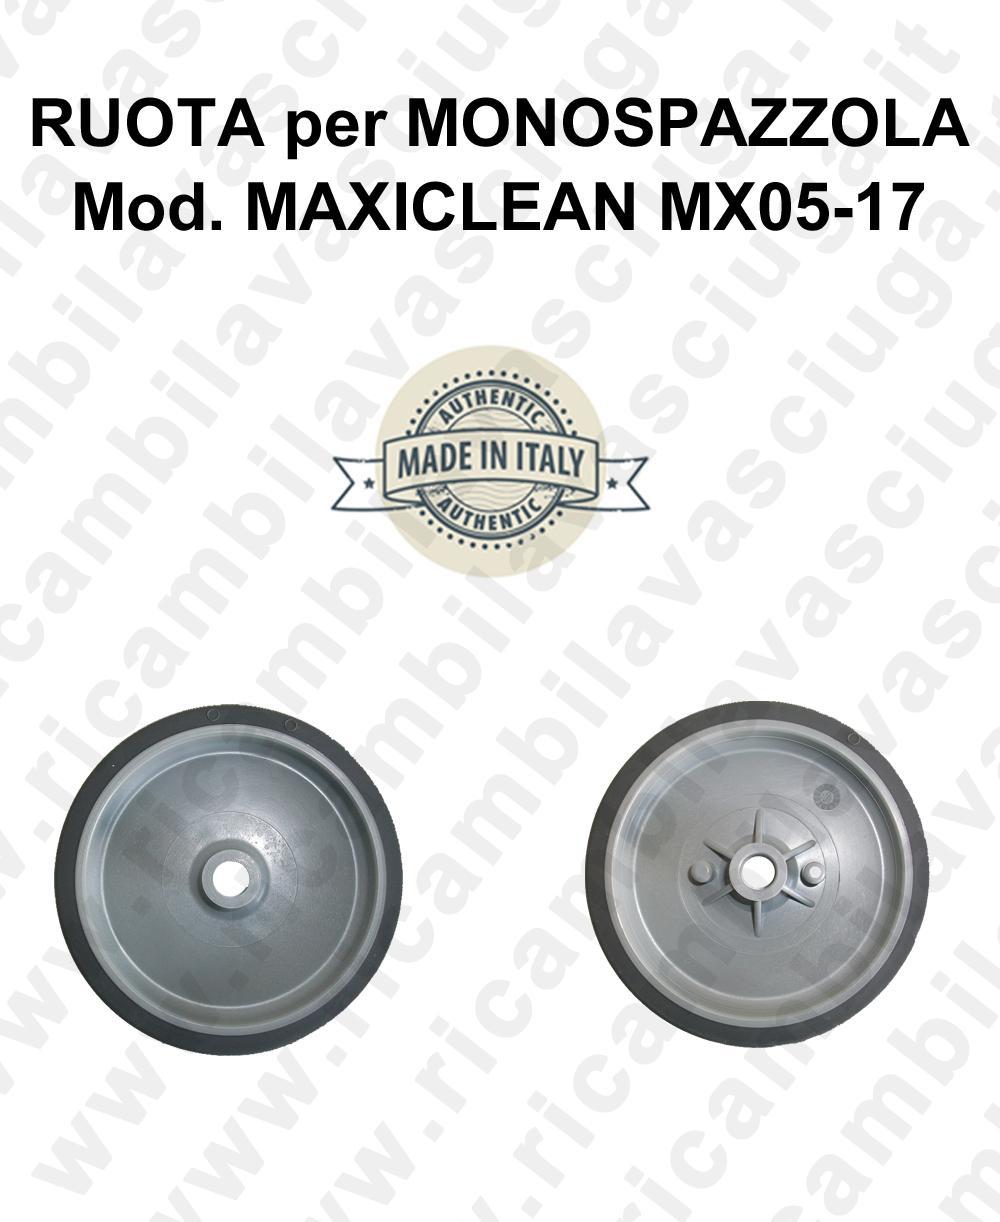 RUOTA for single disc MAXICLEAN MX05-17